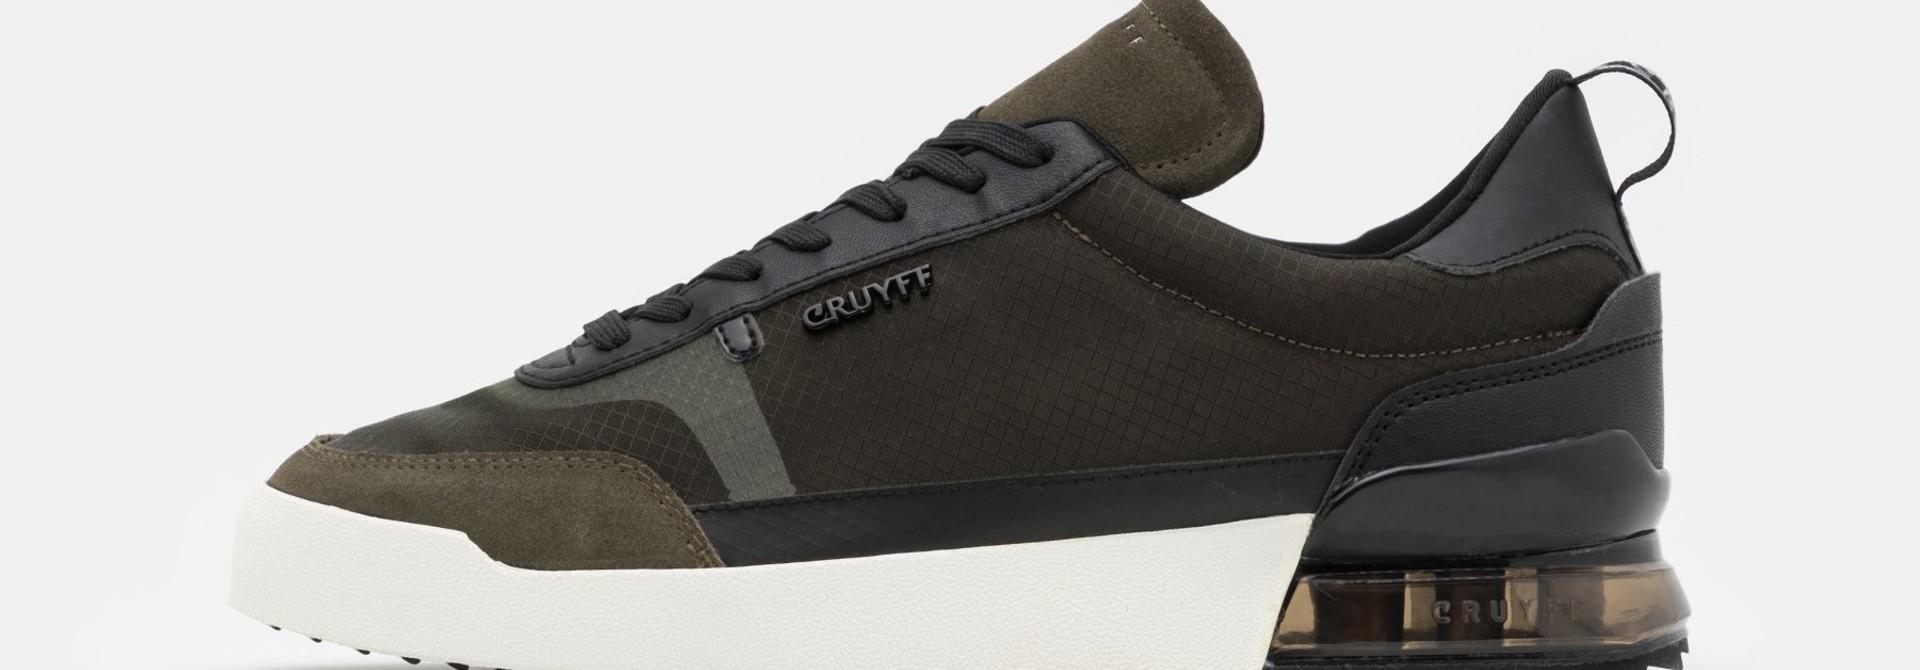 Cruyff Contra Olive/Black